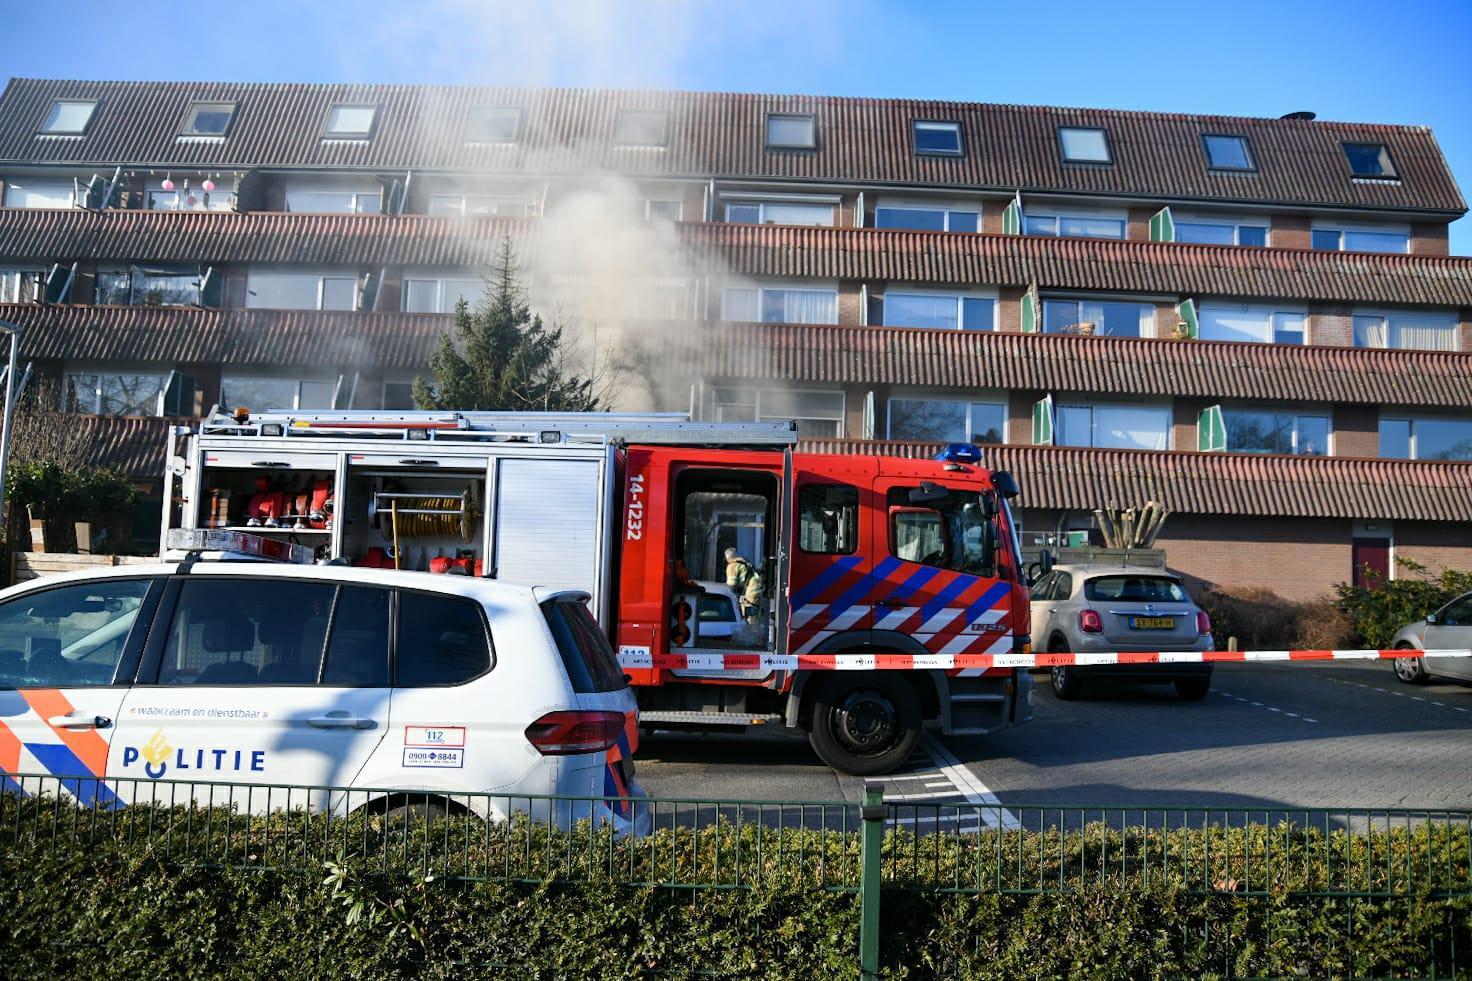 Brand in benedenwoning van appartementencomplex in Bussum, drie huizen ontruimd